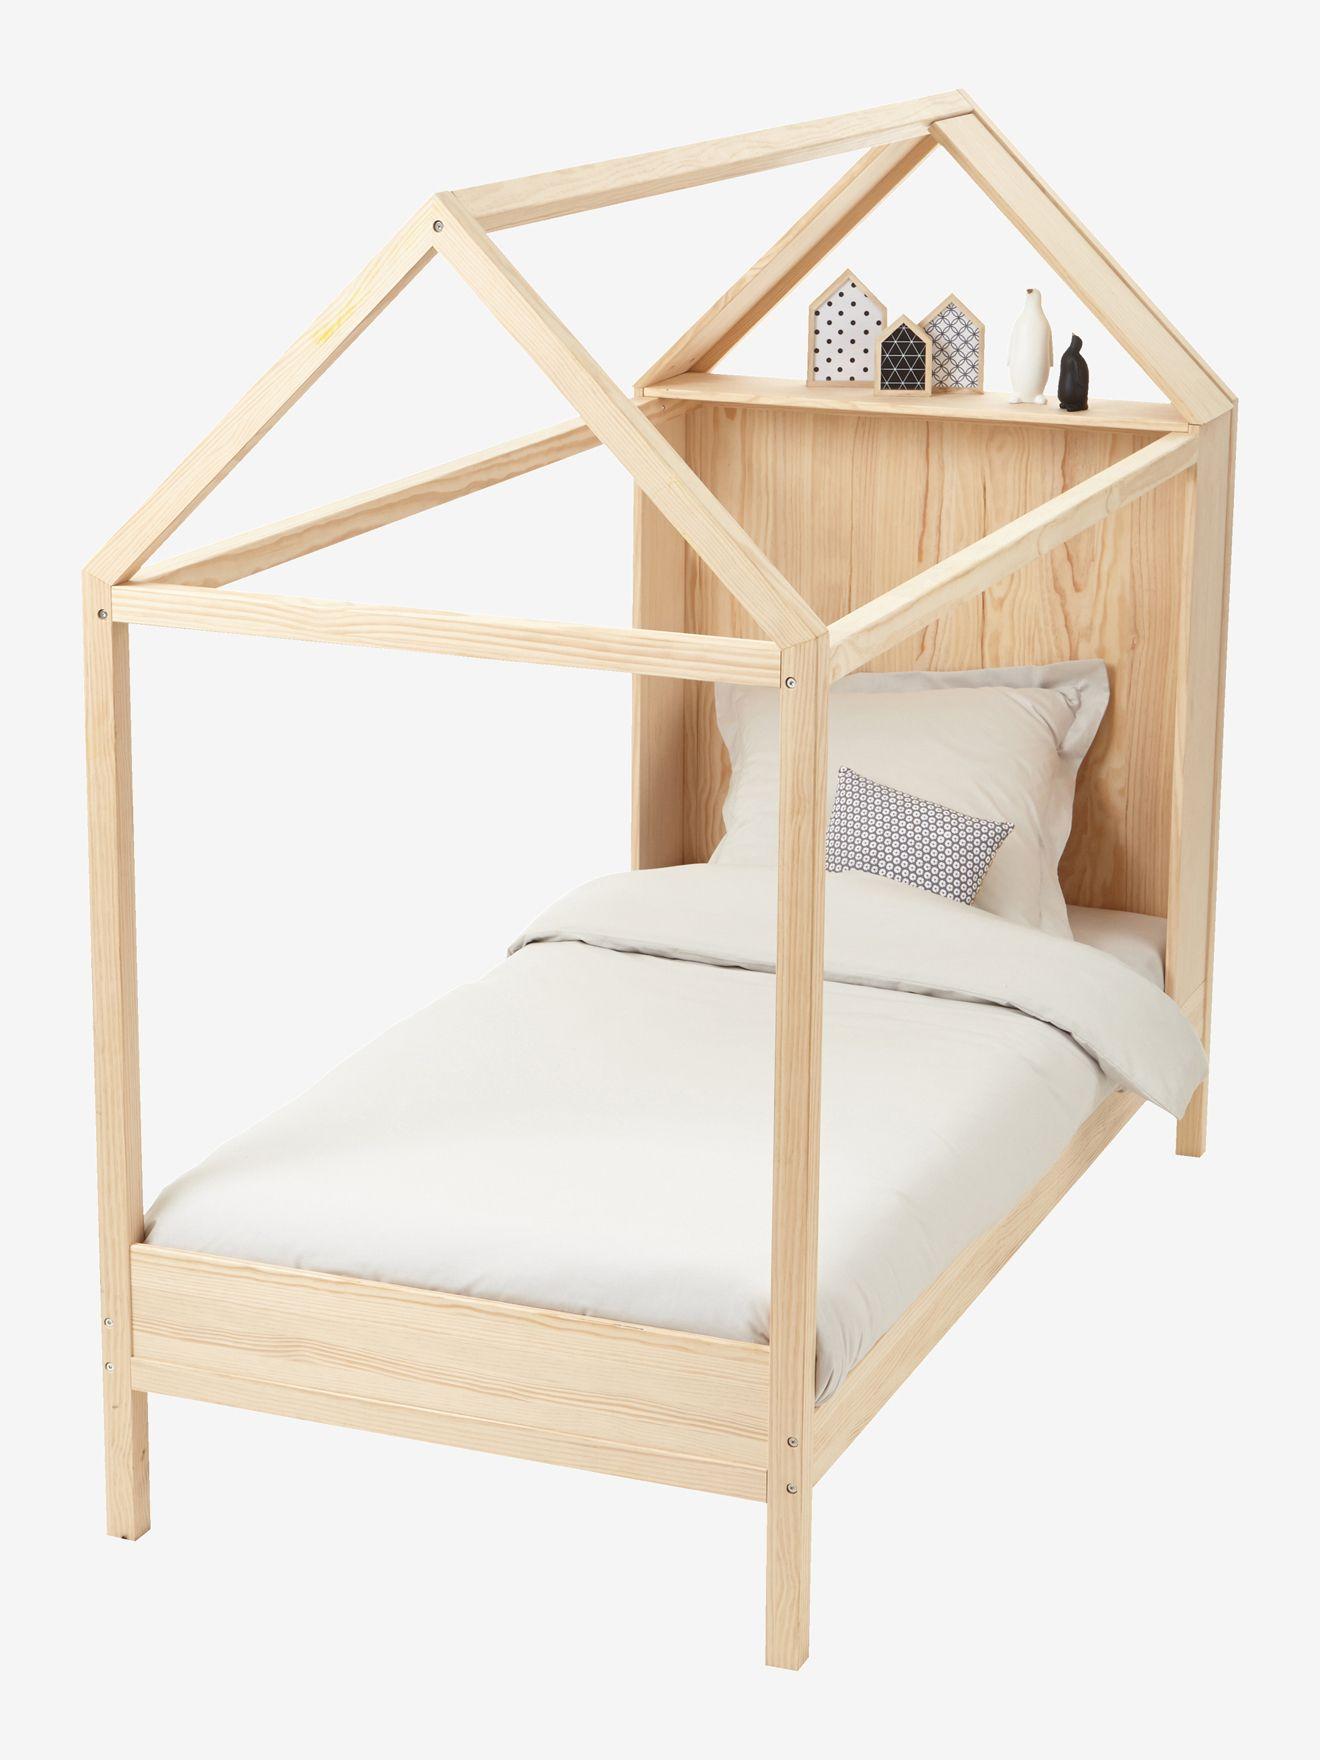 Lit cabane en bois bois - Vertbaudet | Chambre Enfant / Kid ...